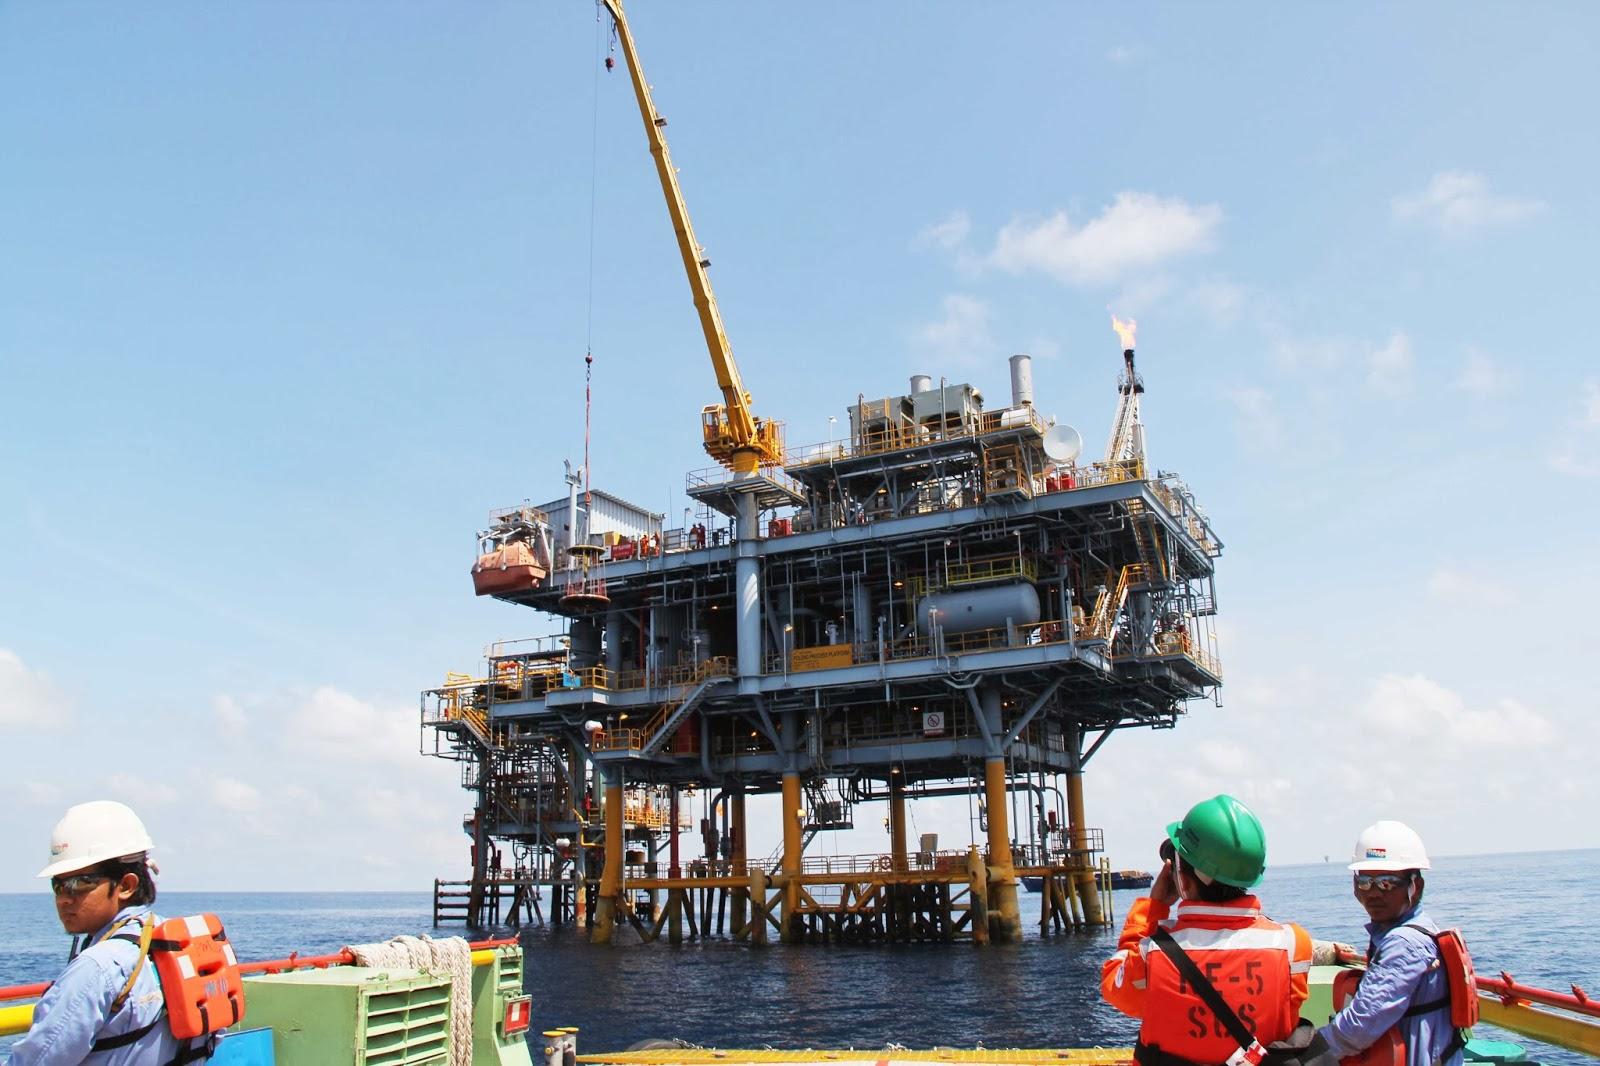 Lowongan Pekerjaan Pertamina Pontianak 2013 Lowongan Kerja Pt Donggi Senoro Lng Dslng Terbaru Lowongan Kerja Pertamina Untuk D3 Teknik Di Pt Pertamina Hulu Energi